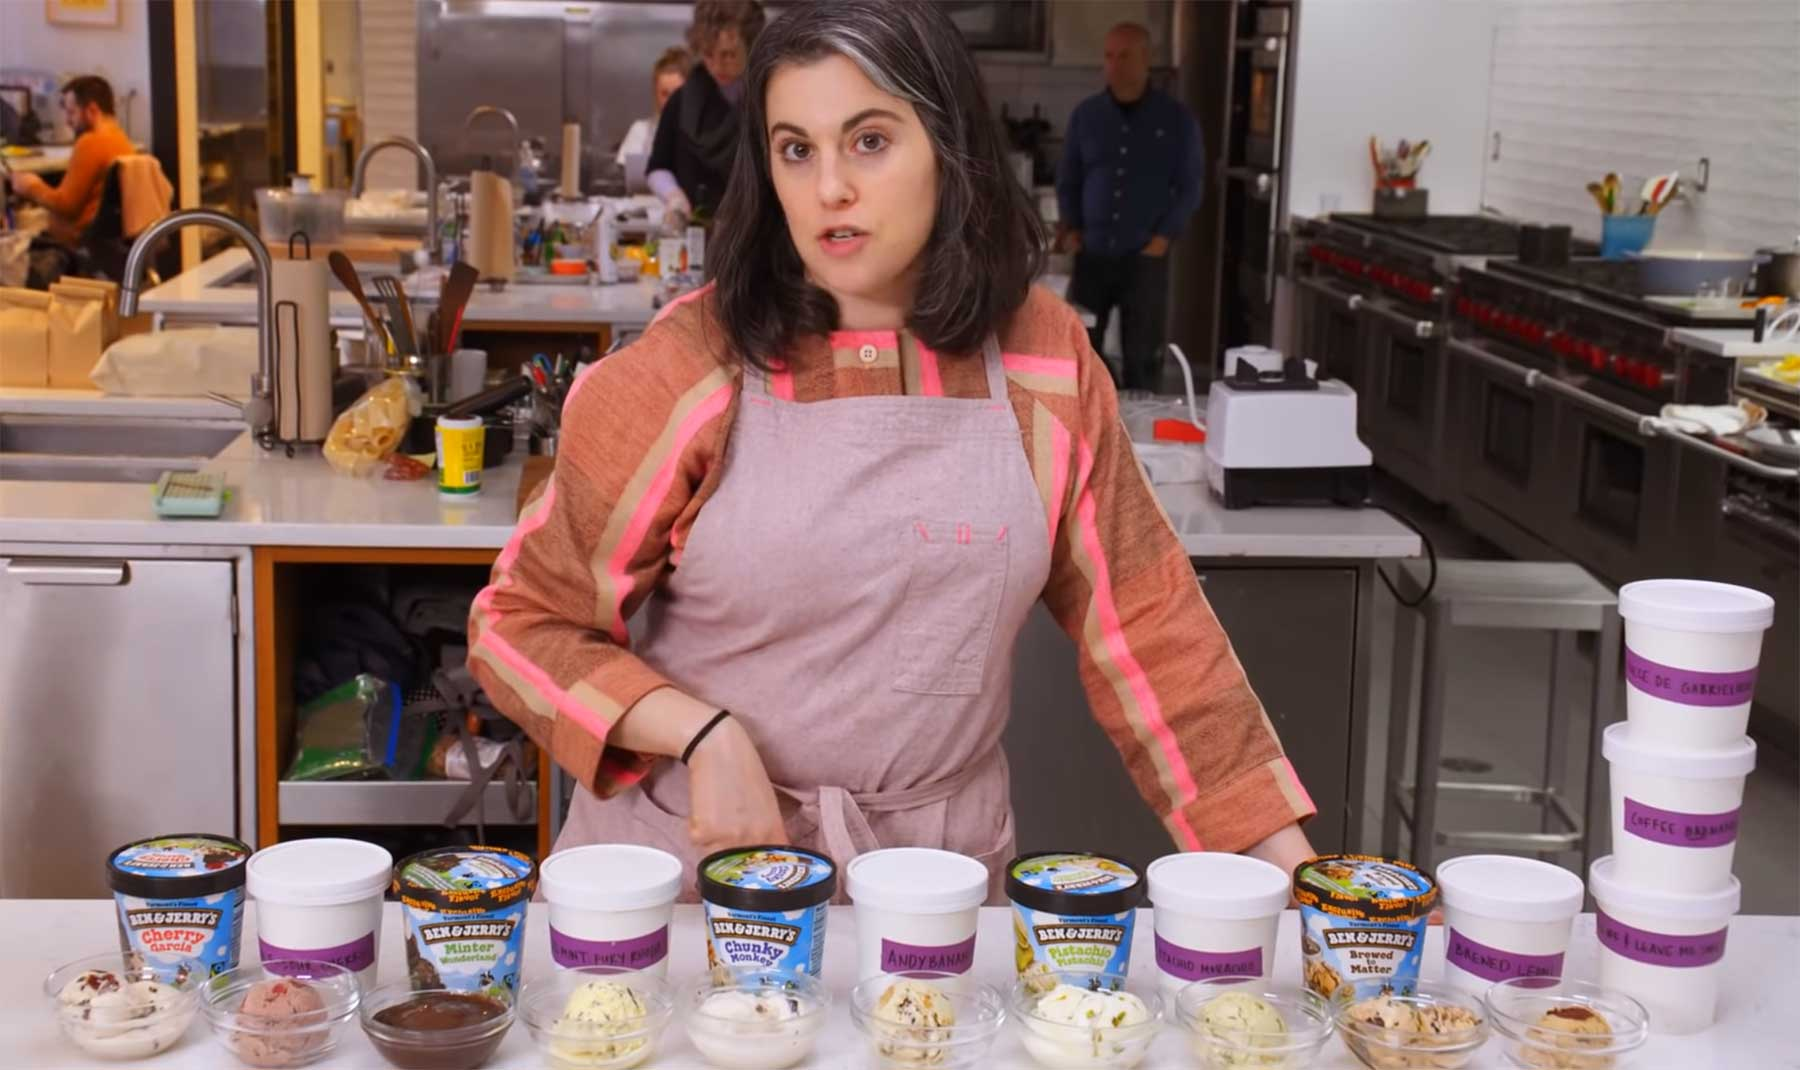 Gourmet-Köchin versucht, Ben & Jerry's Eis nachzumachen ben-and-jerrys-eiscreme-selber-machen